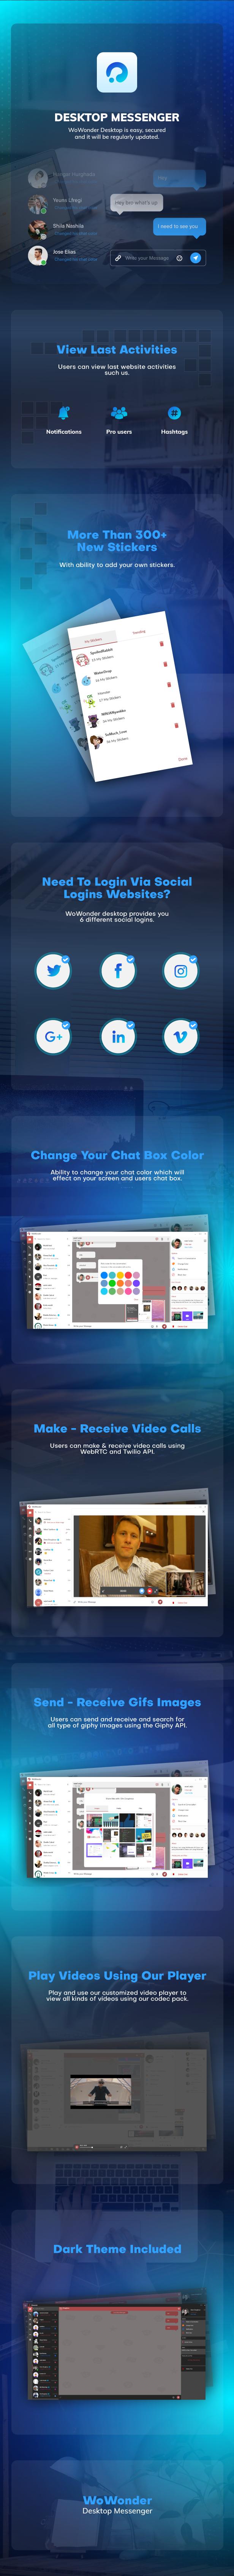 WoWonder Desktop - A Windows Messenger For WoWonder Social Script - 2